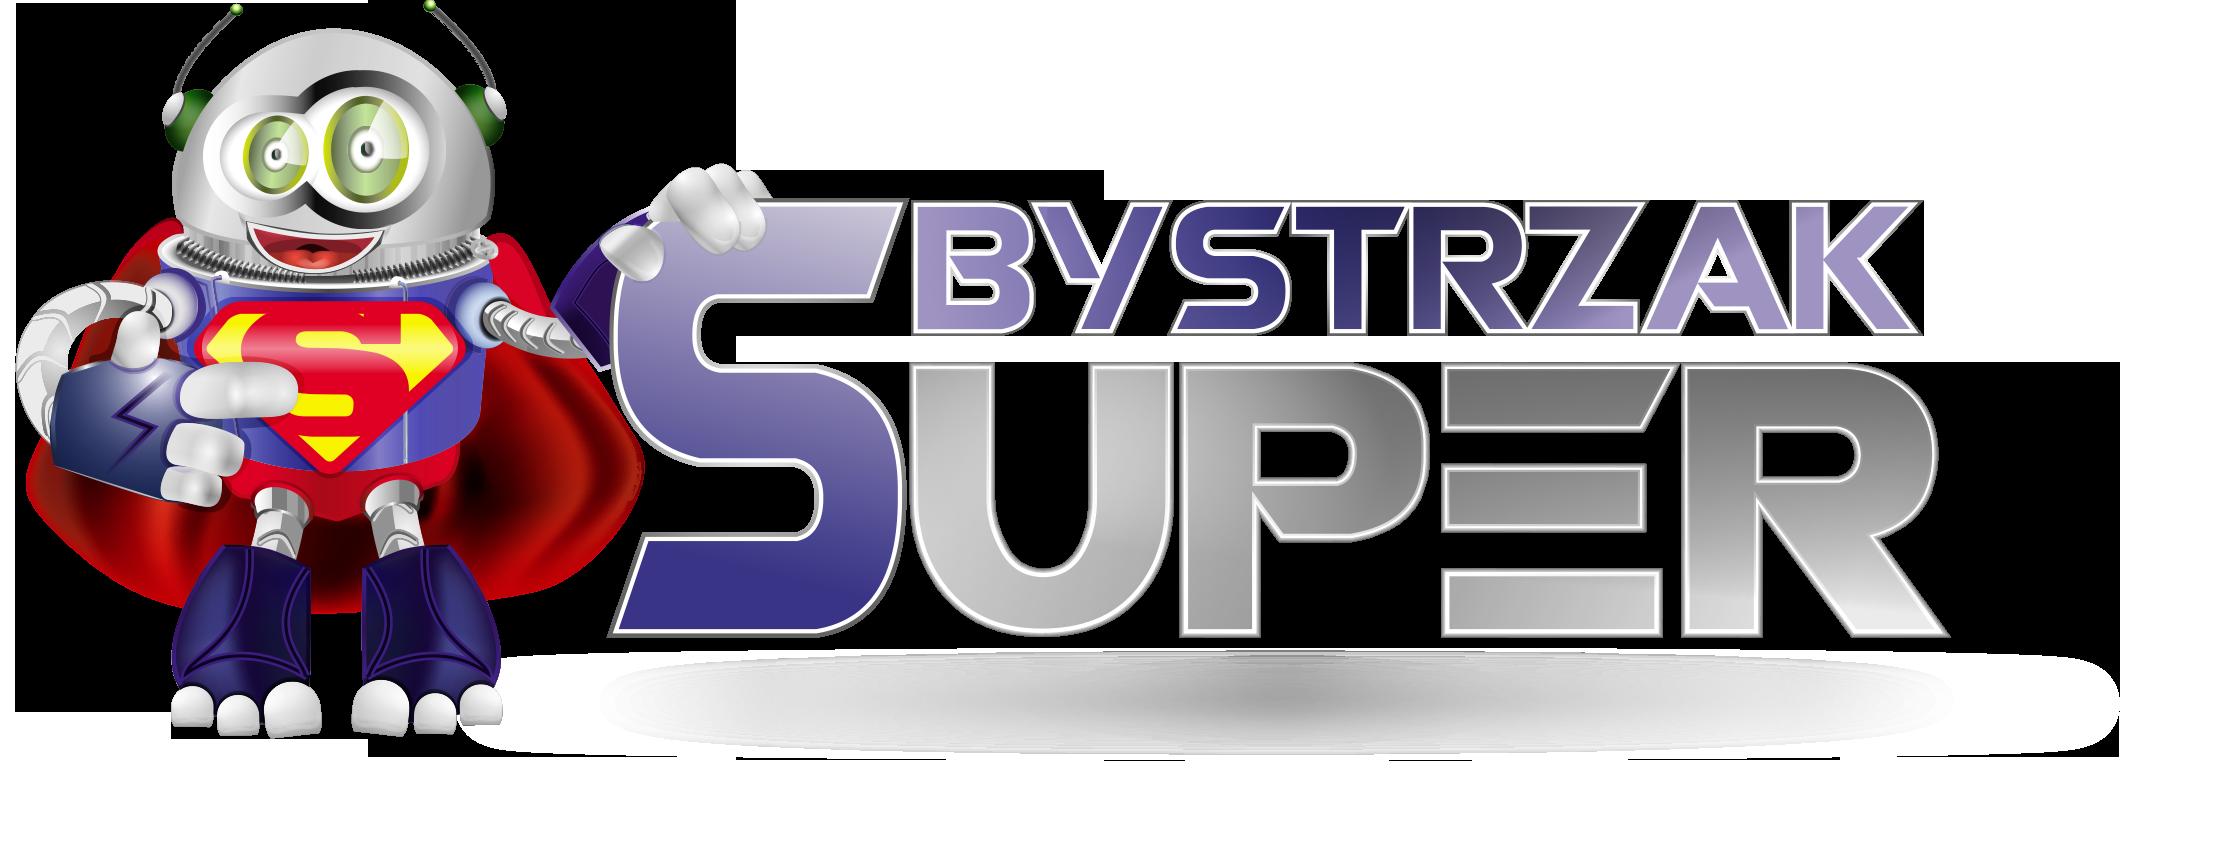 Super Bystrzak